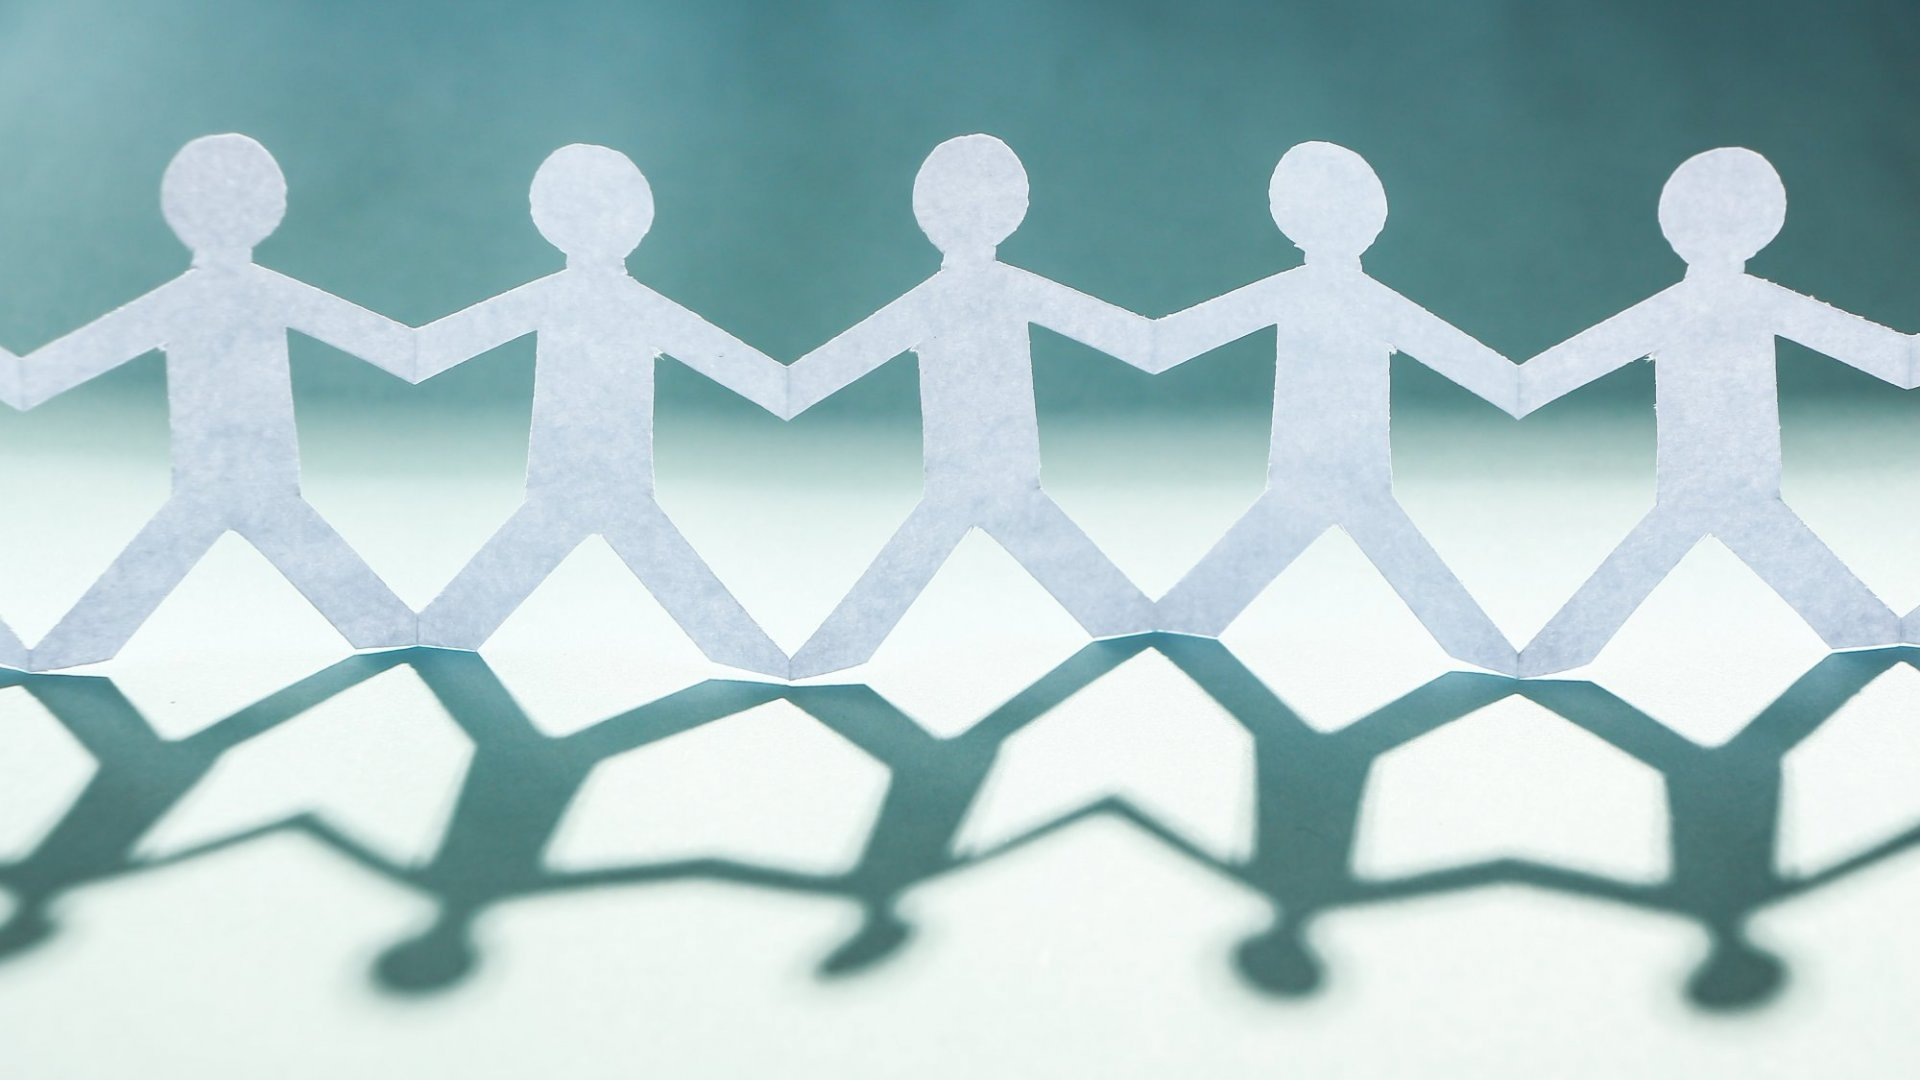 Gawker Website Employees Vote to Unionize